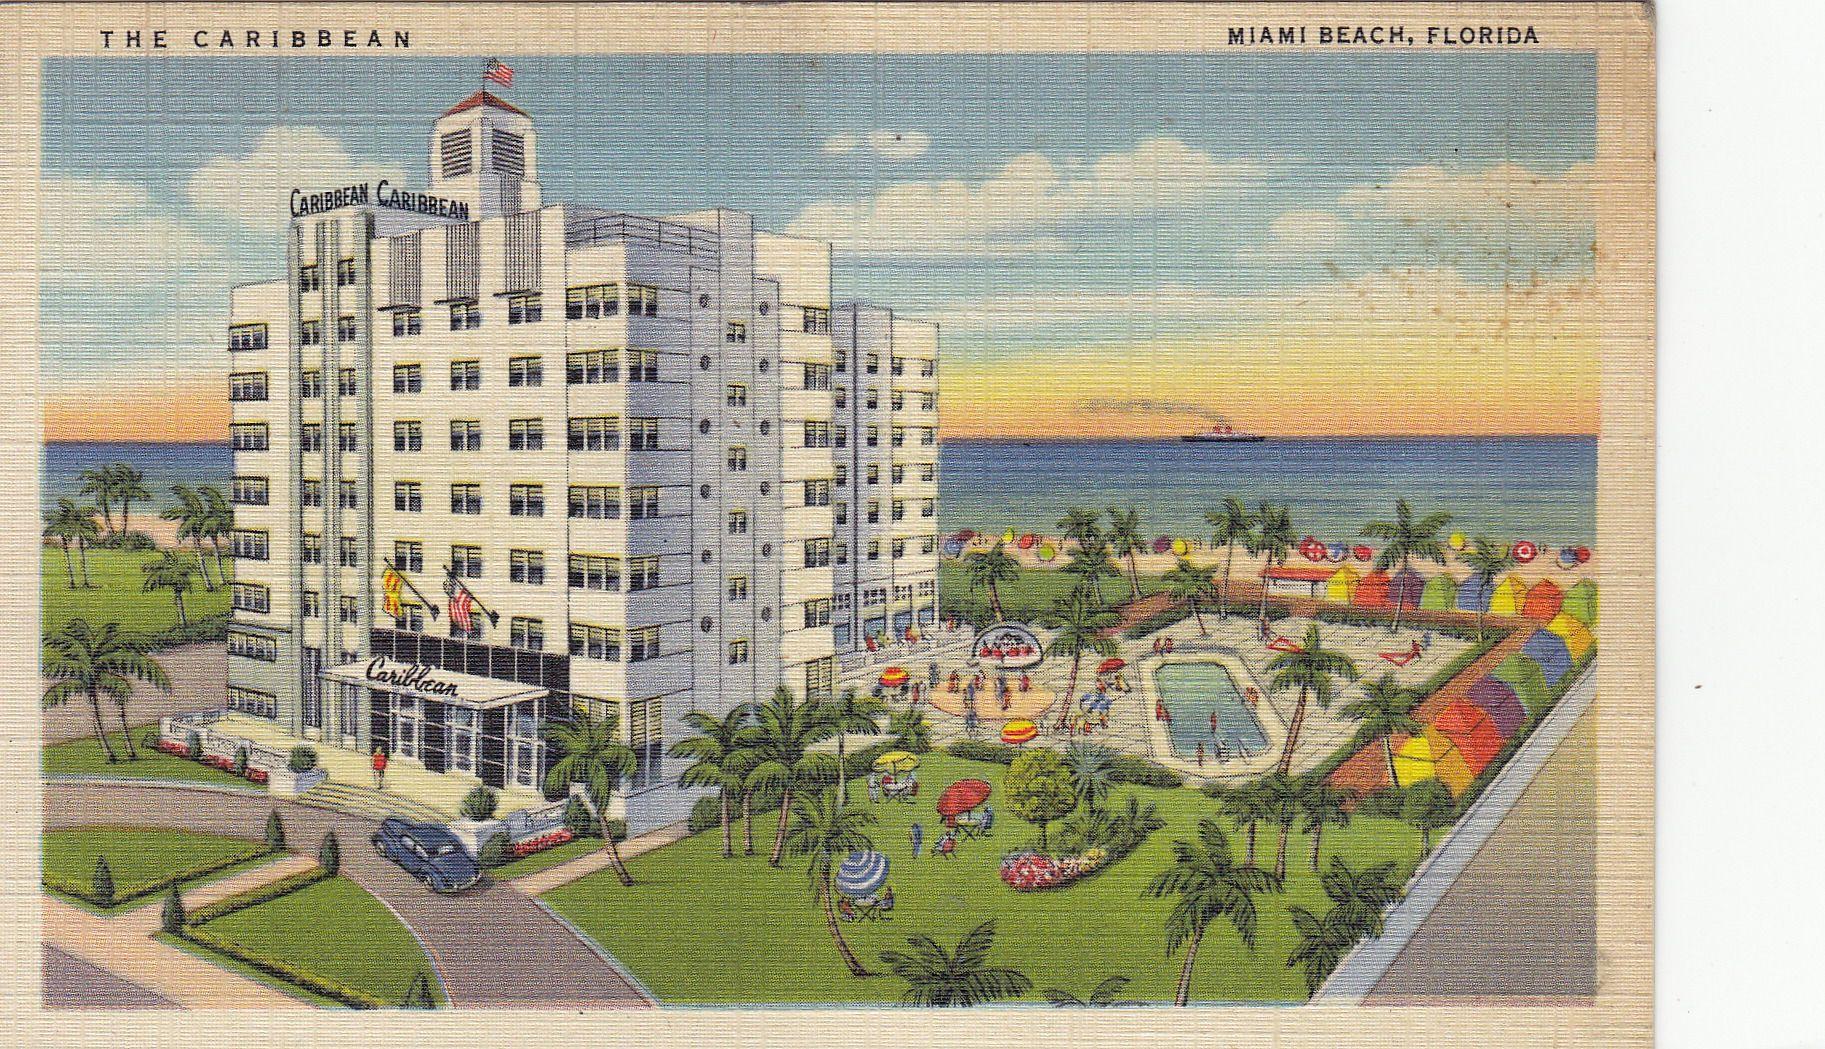 Caribbean Hotel Miami Beach Fl